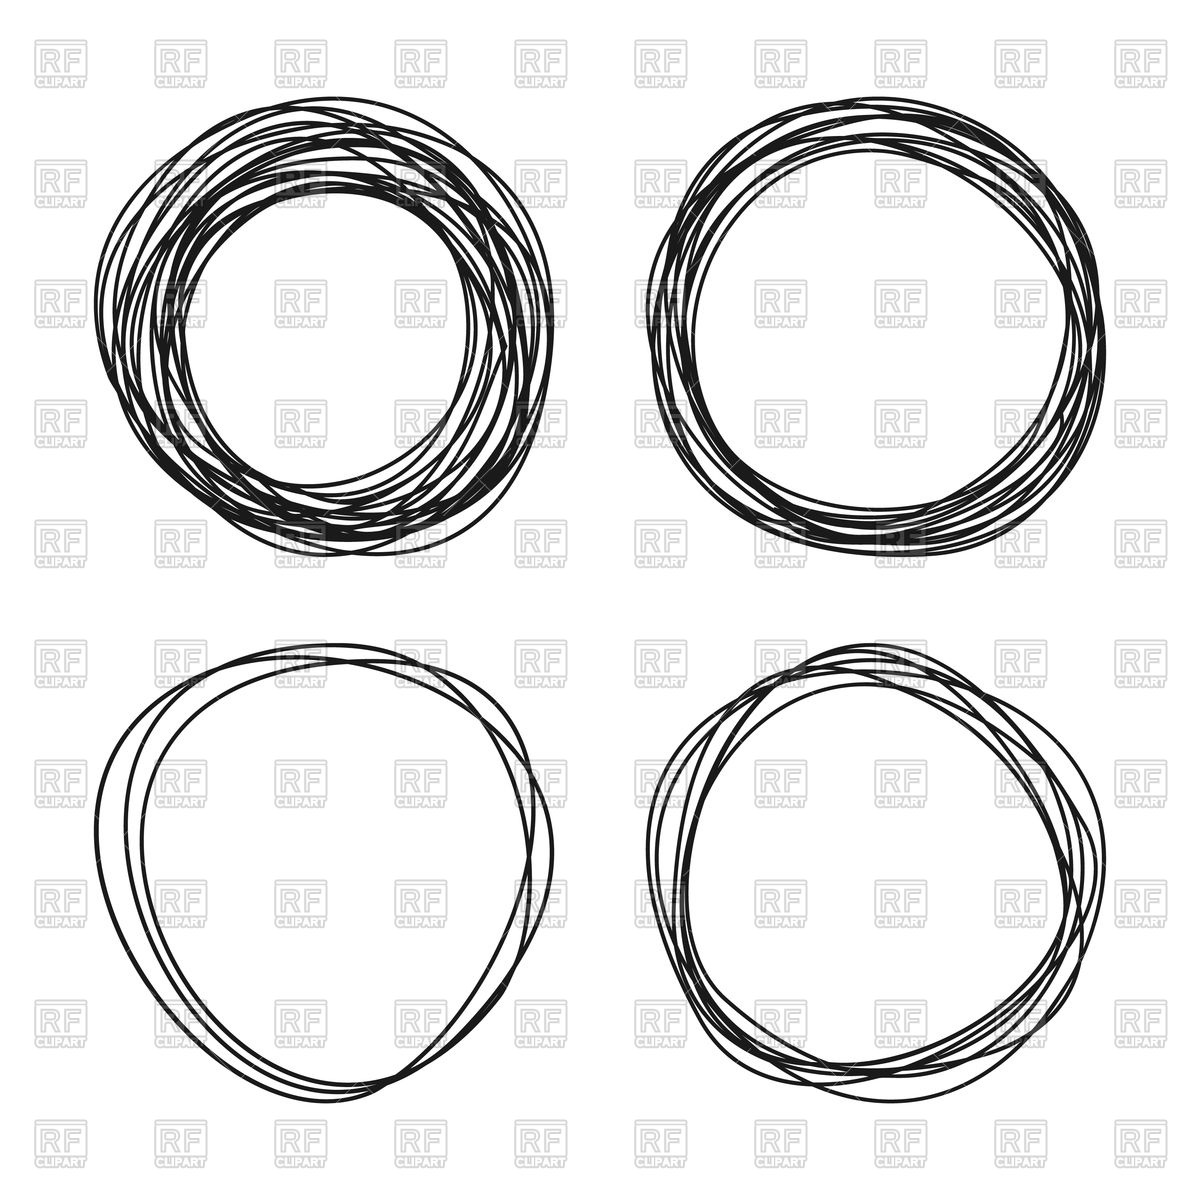 1200x1200 Circle Sketch Vector Image Vector Artwork Of Design Elements